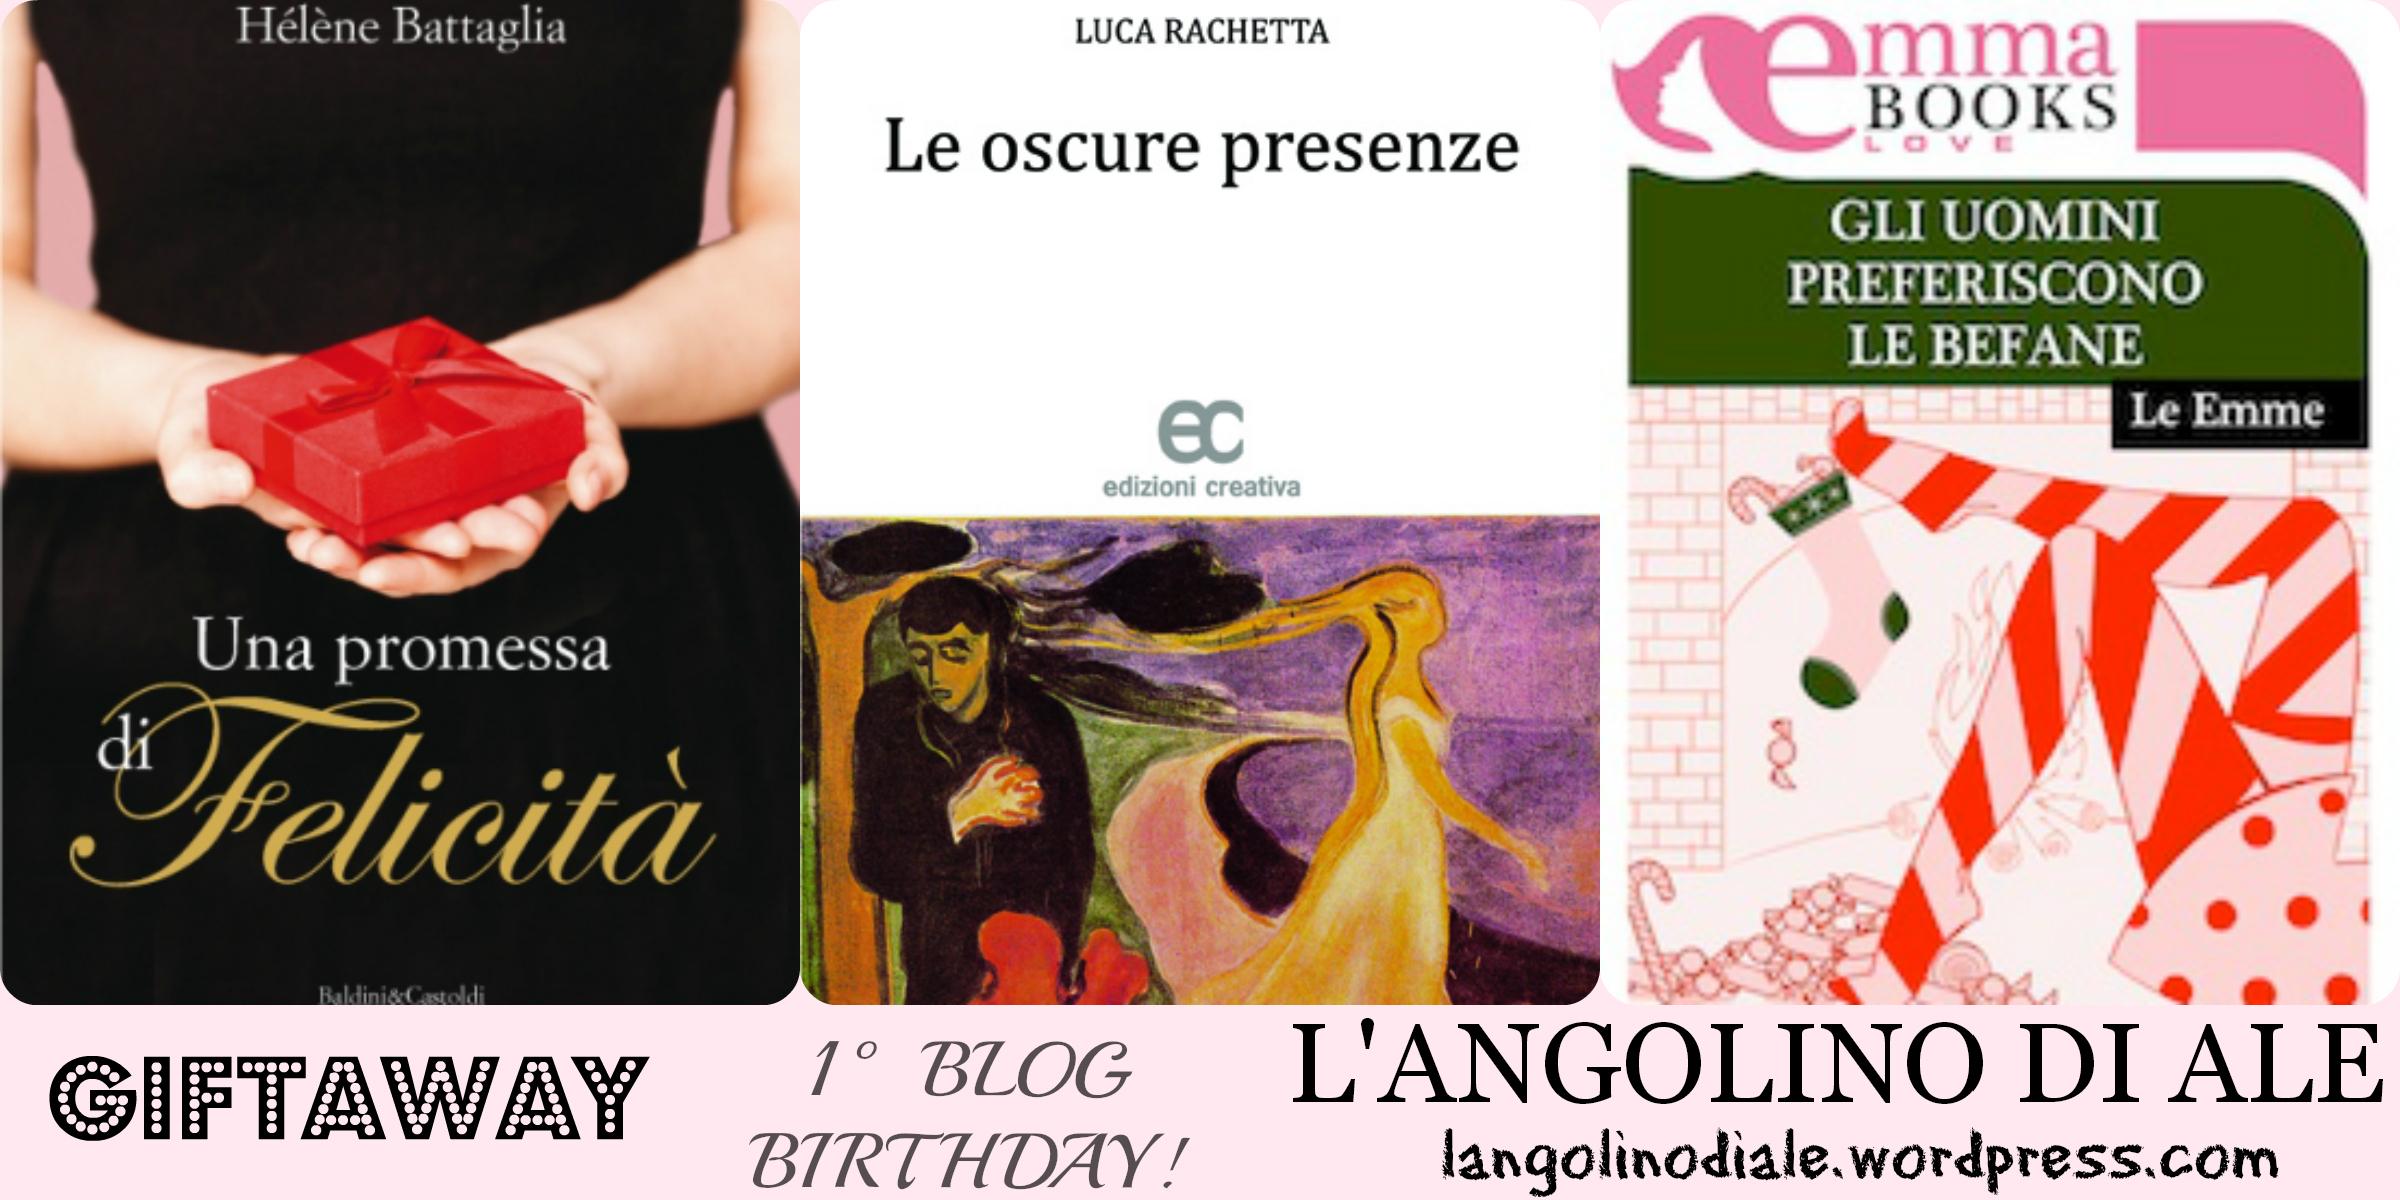 The winner is…!! I Giftaway dell'angolino